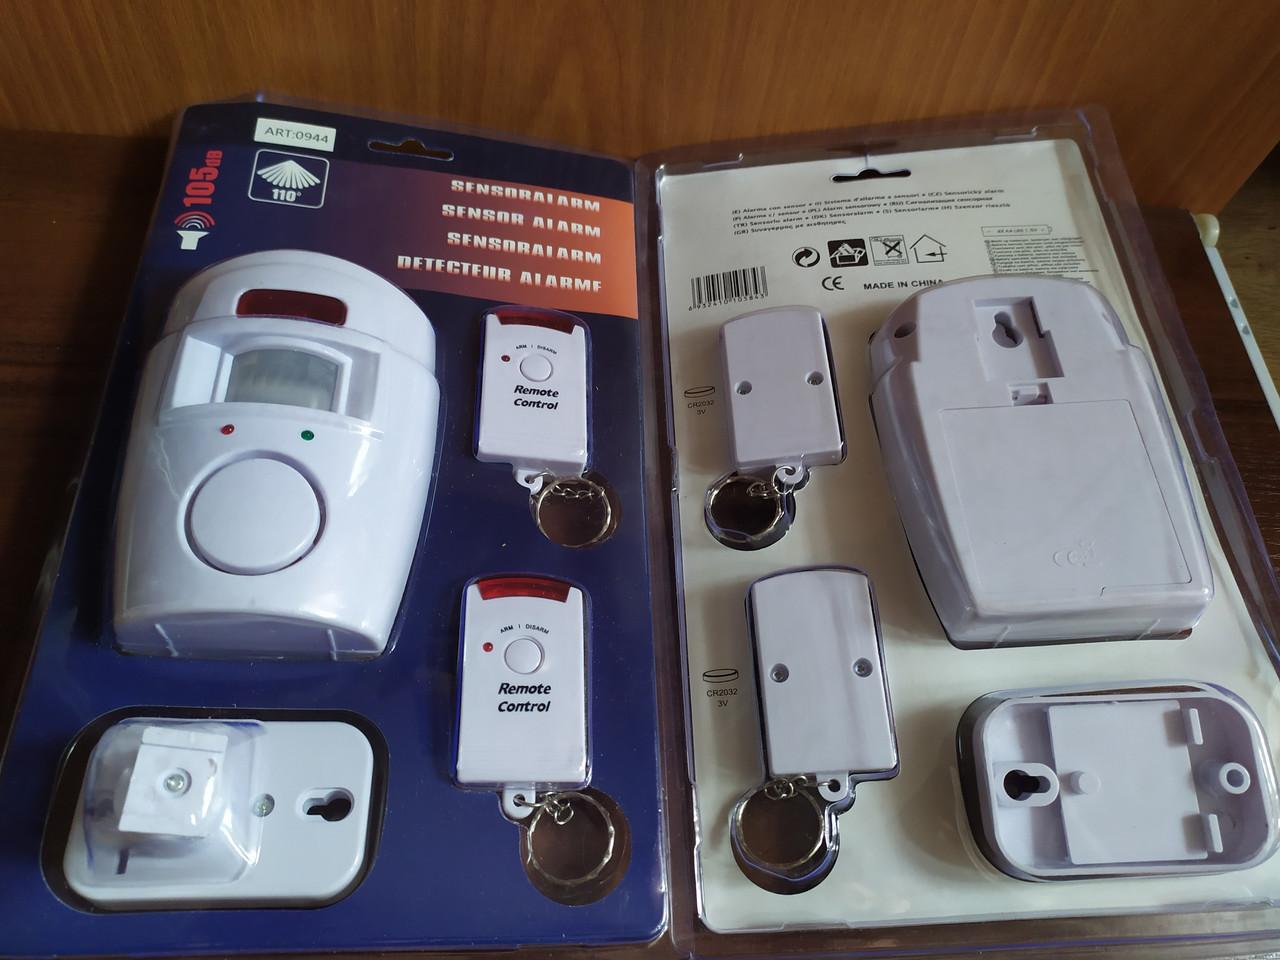 Сенсорна сигналізація з датчиком руху Alarm з пультом 2 шт